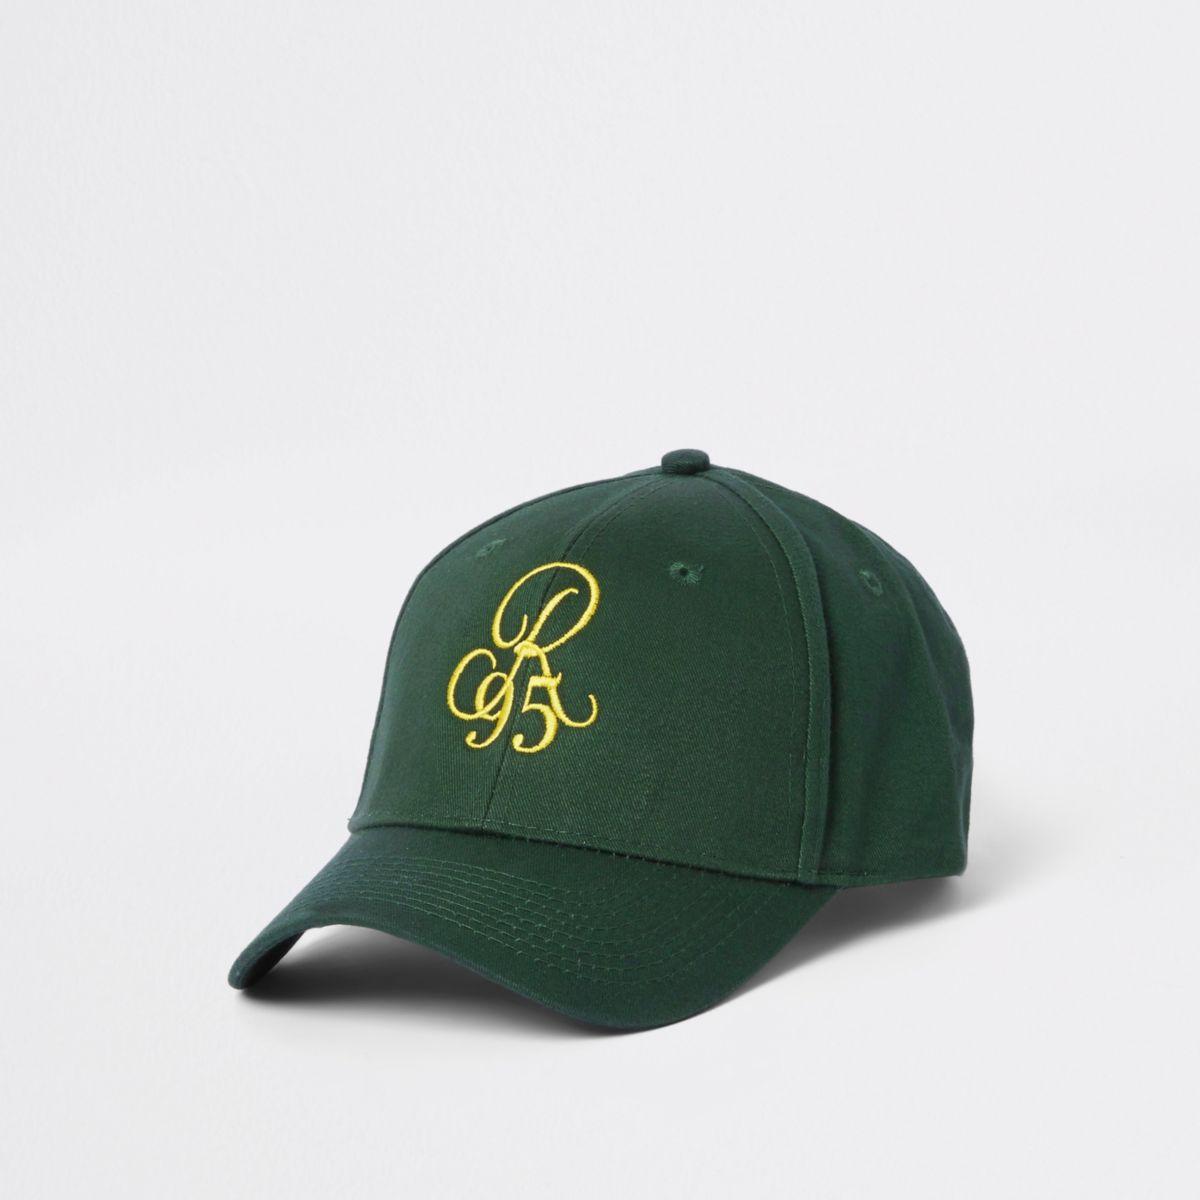 Green 'R95' baseball cap